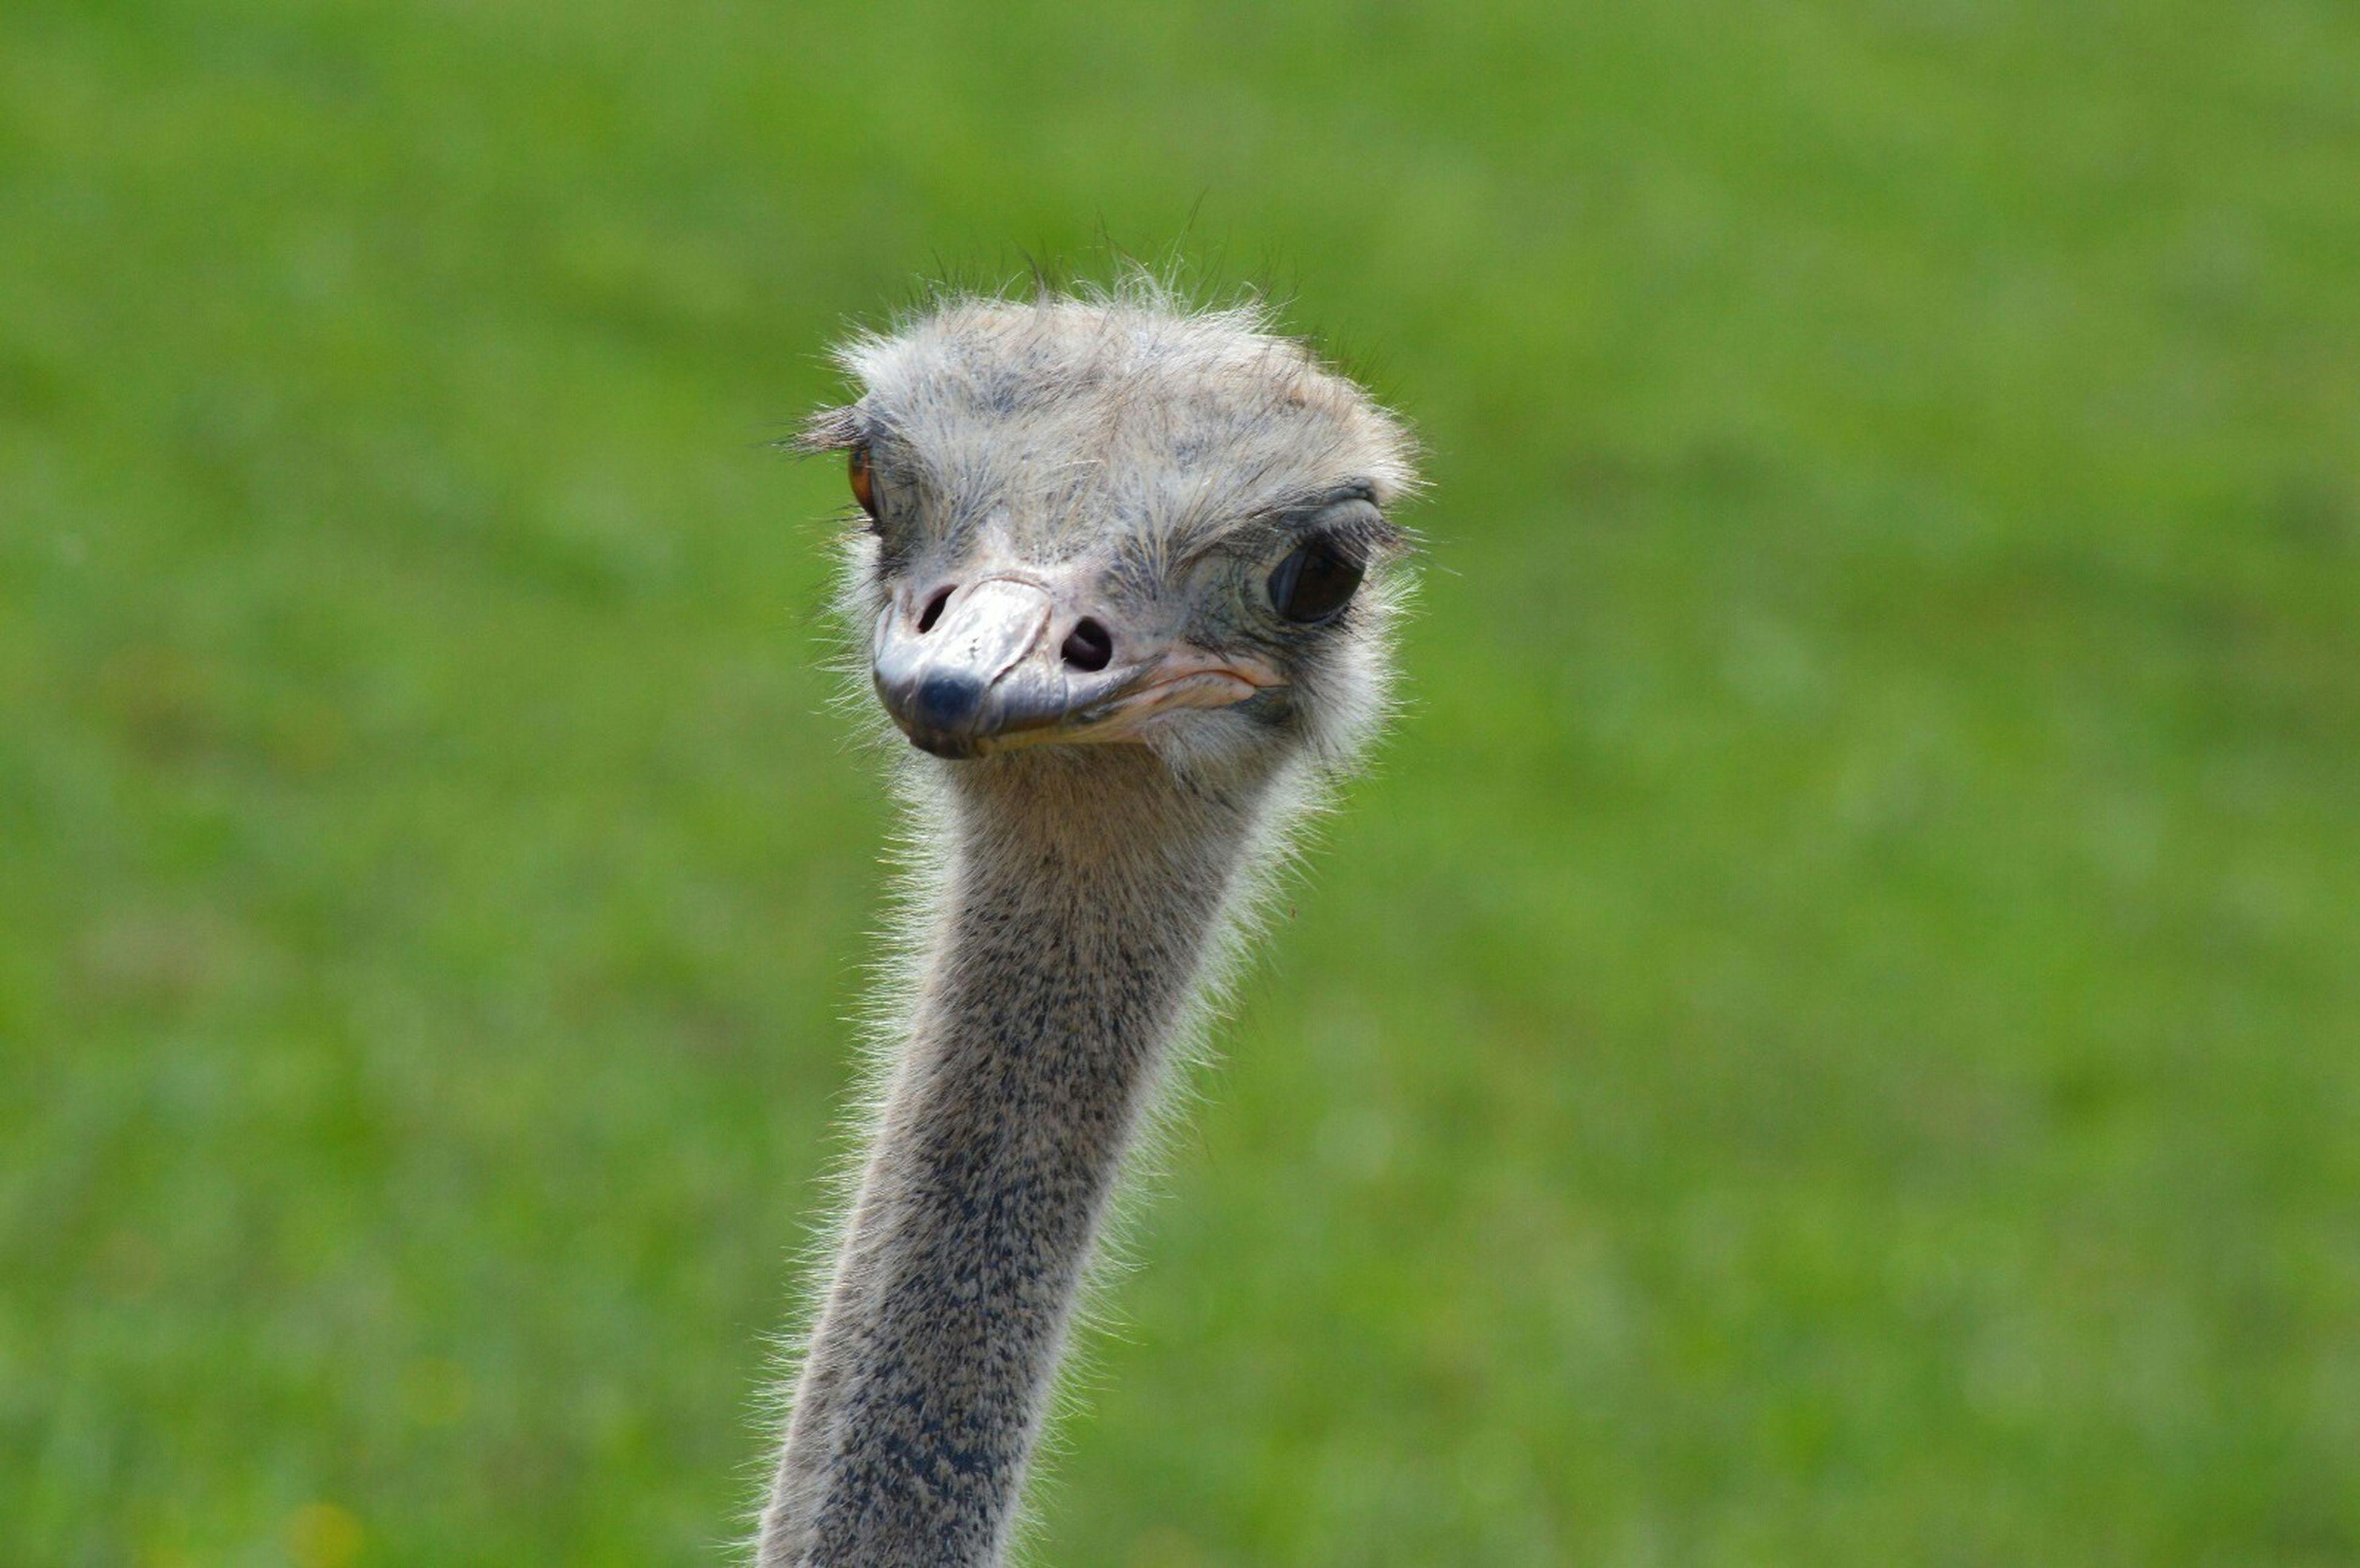 Nature Naturaleza Avestruz Ostrich Animals Animales Aves Birds Parquenaturalcabarceno The Purist (no Edit, No Filter)